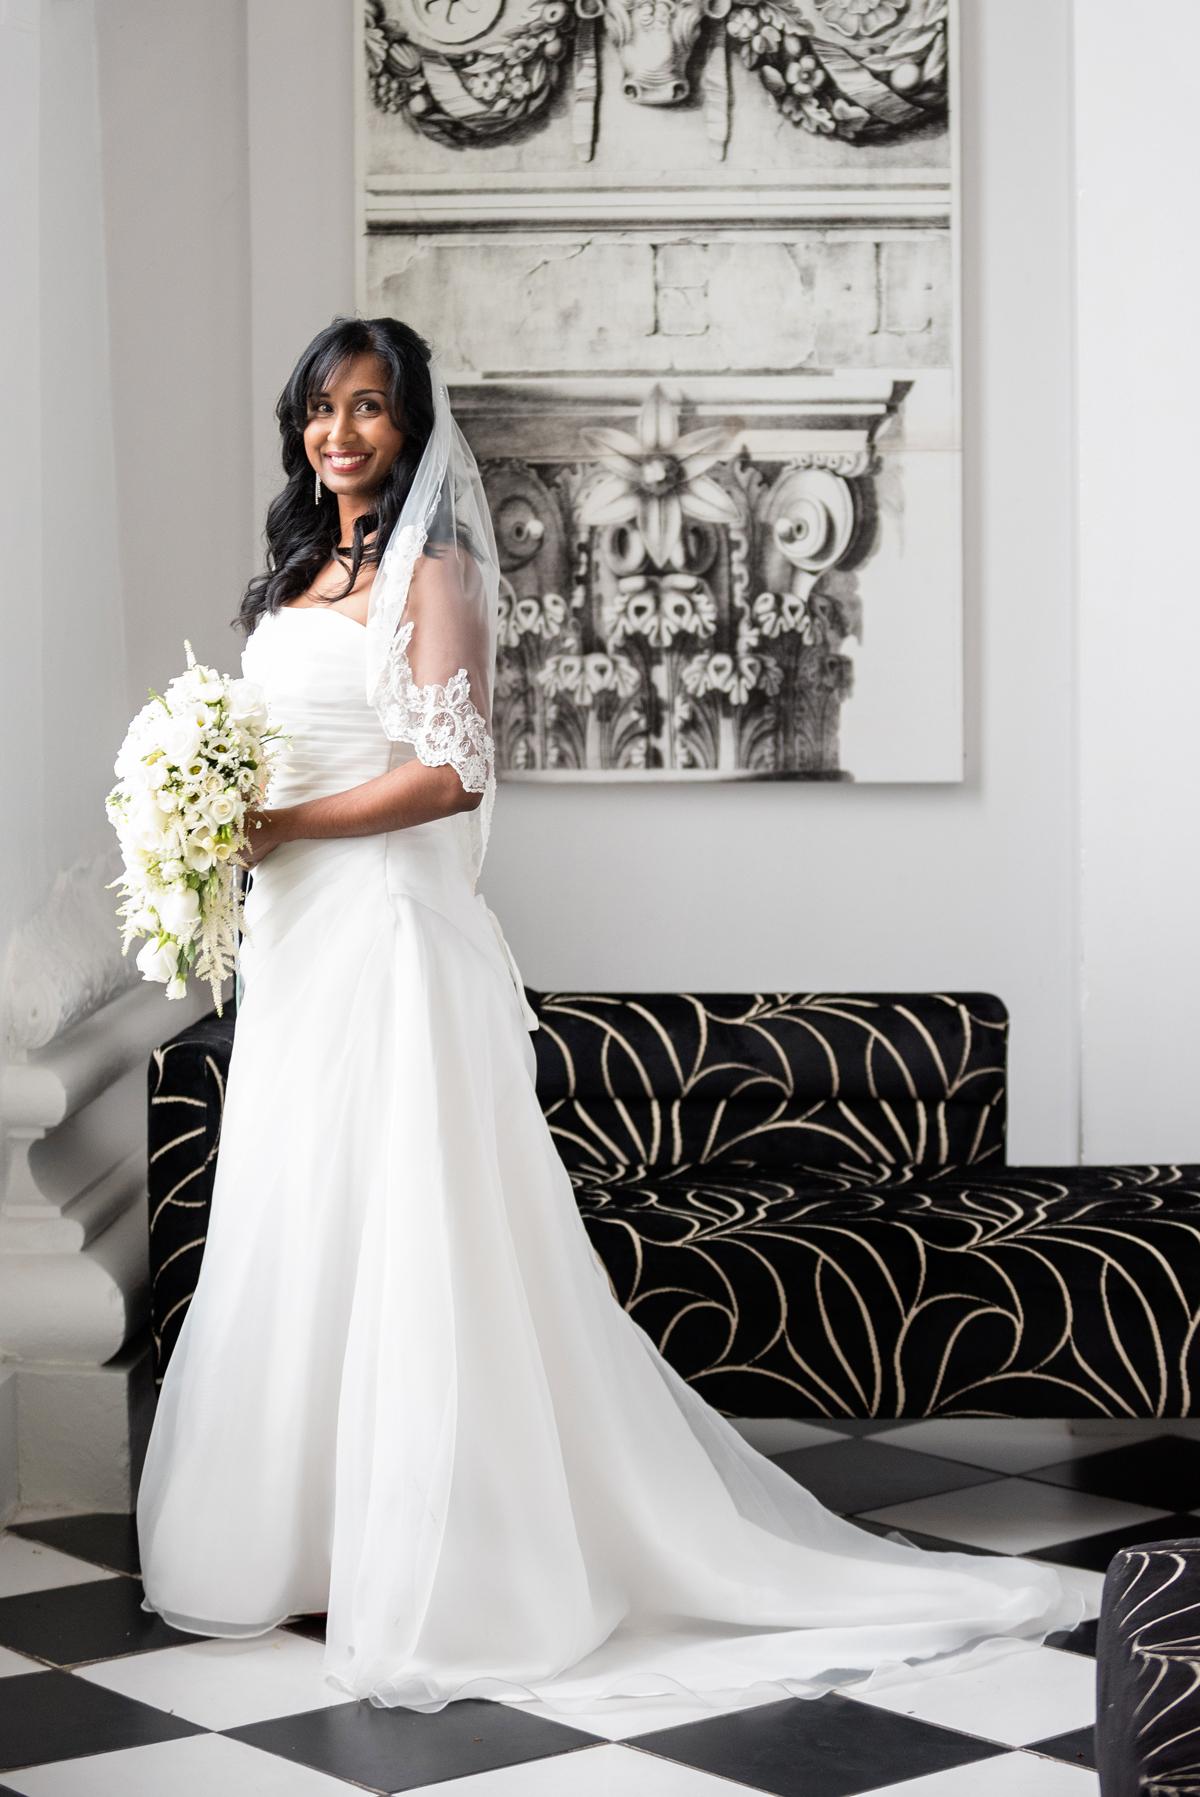 Beautiful bride, wedding Windsor